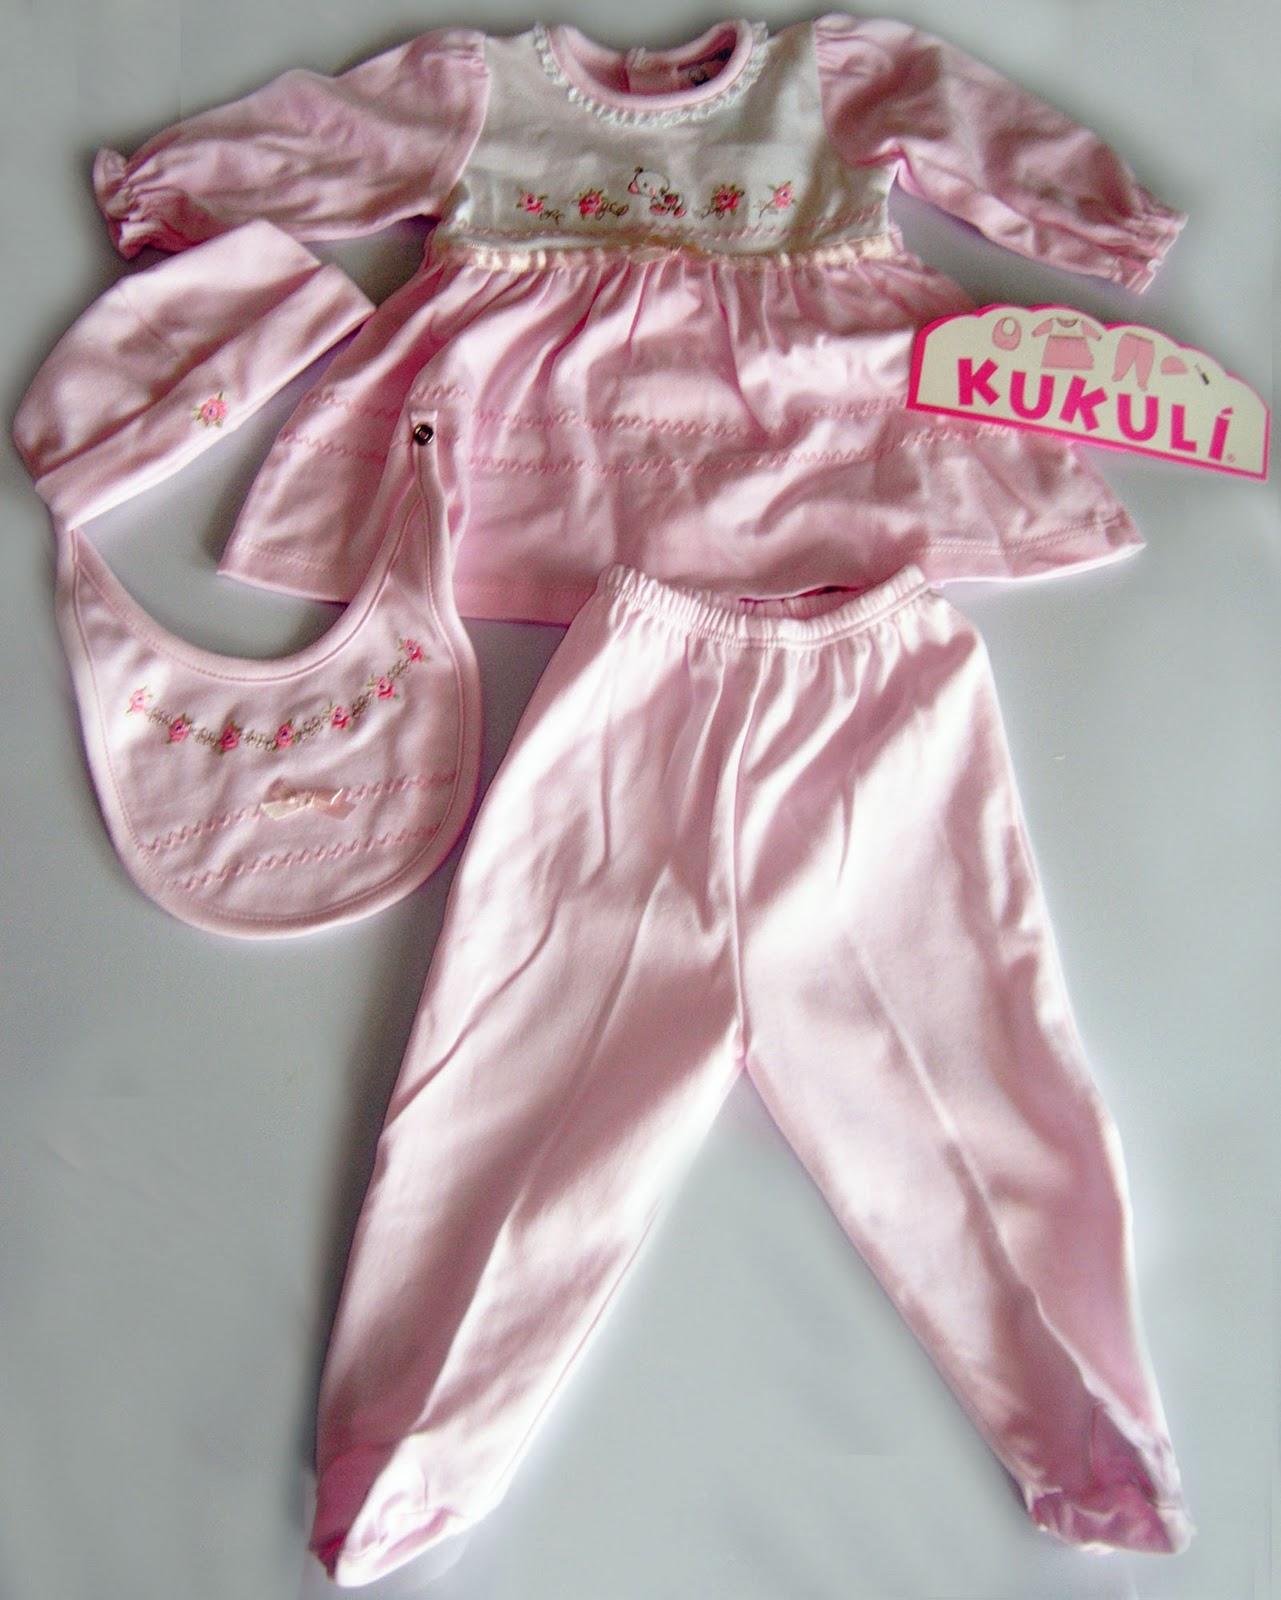 Vestidos de bebe kukuli